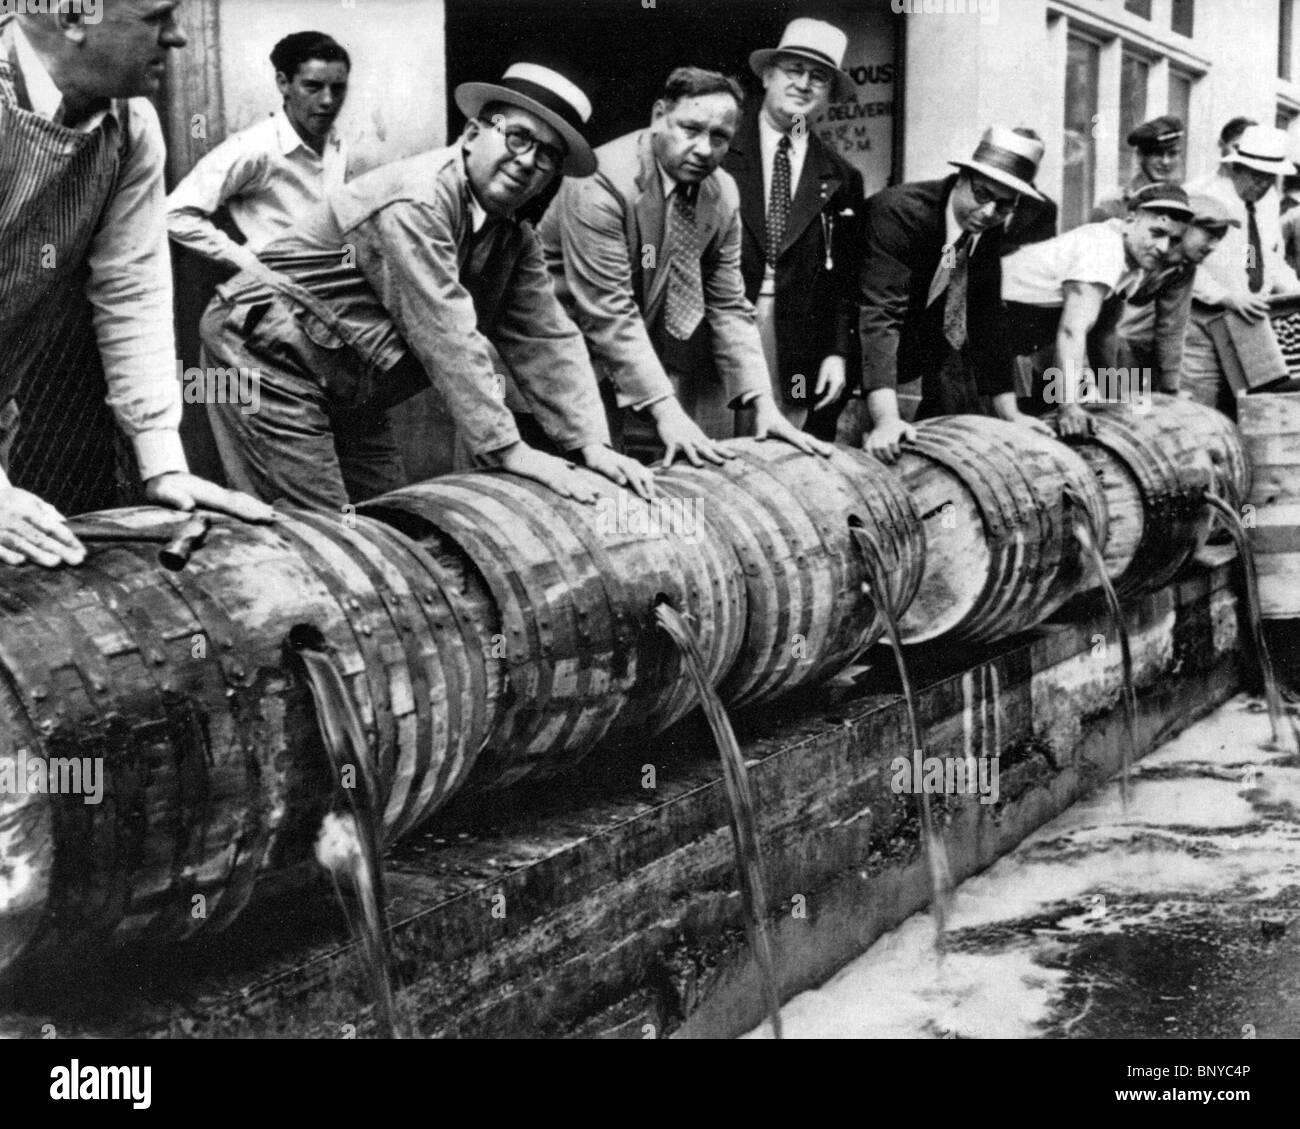 US-Verbot uns Agenten Durchsetzung des Rechts gegen bootleg Schnaps in den 1930er Jahren Stockbild